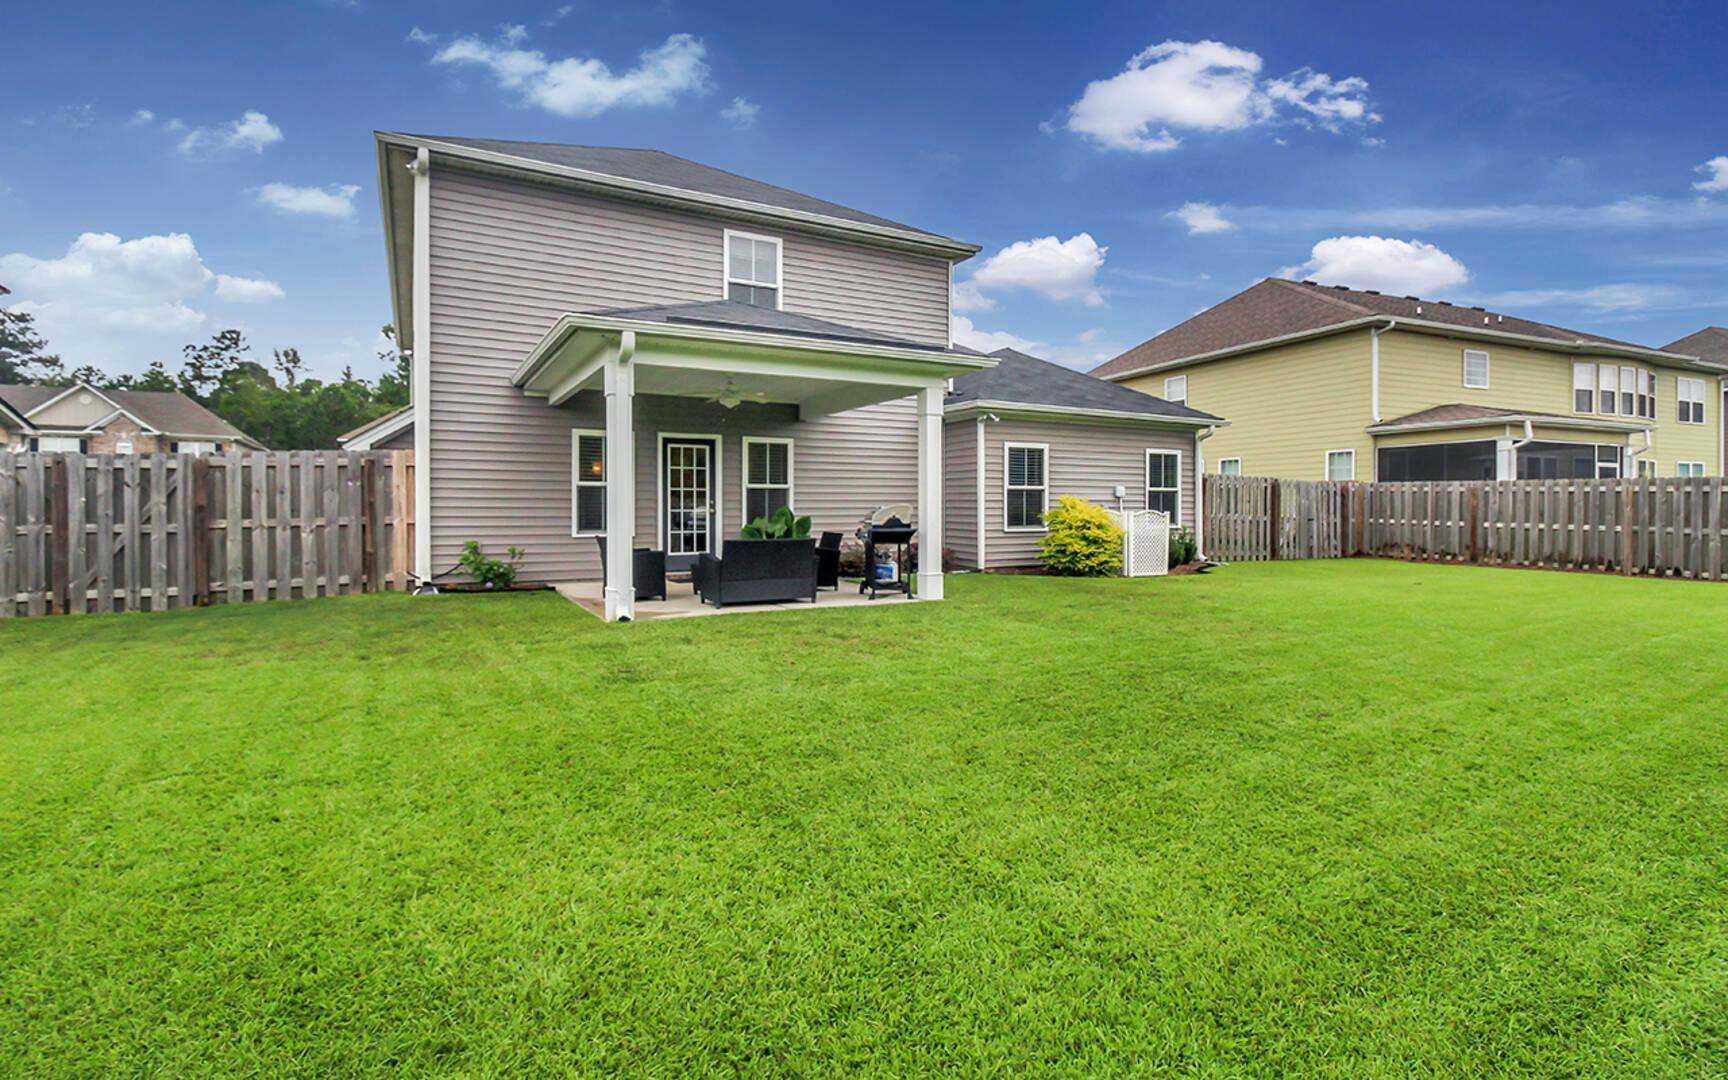 109 Bluegrass Cir Guyton, GA 31312